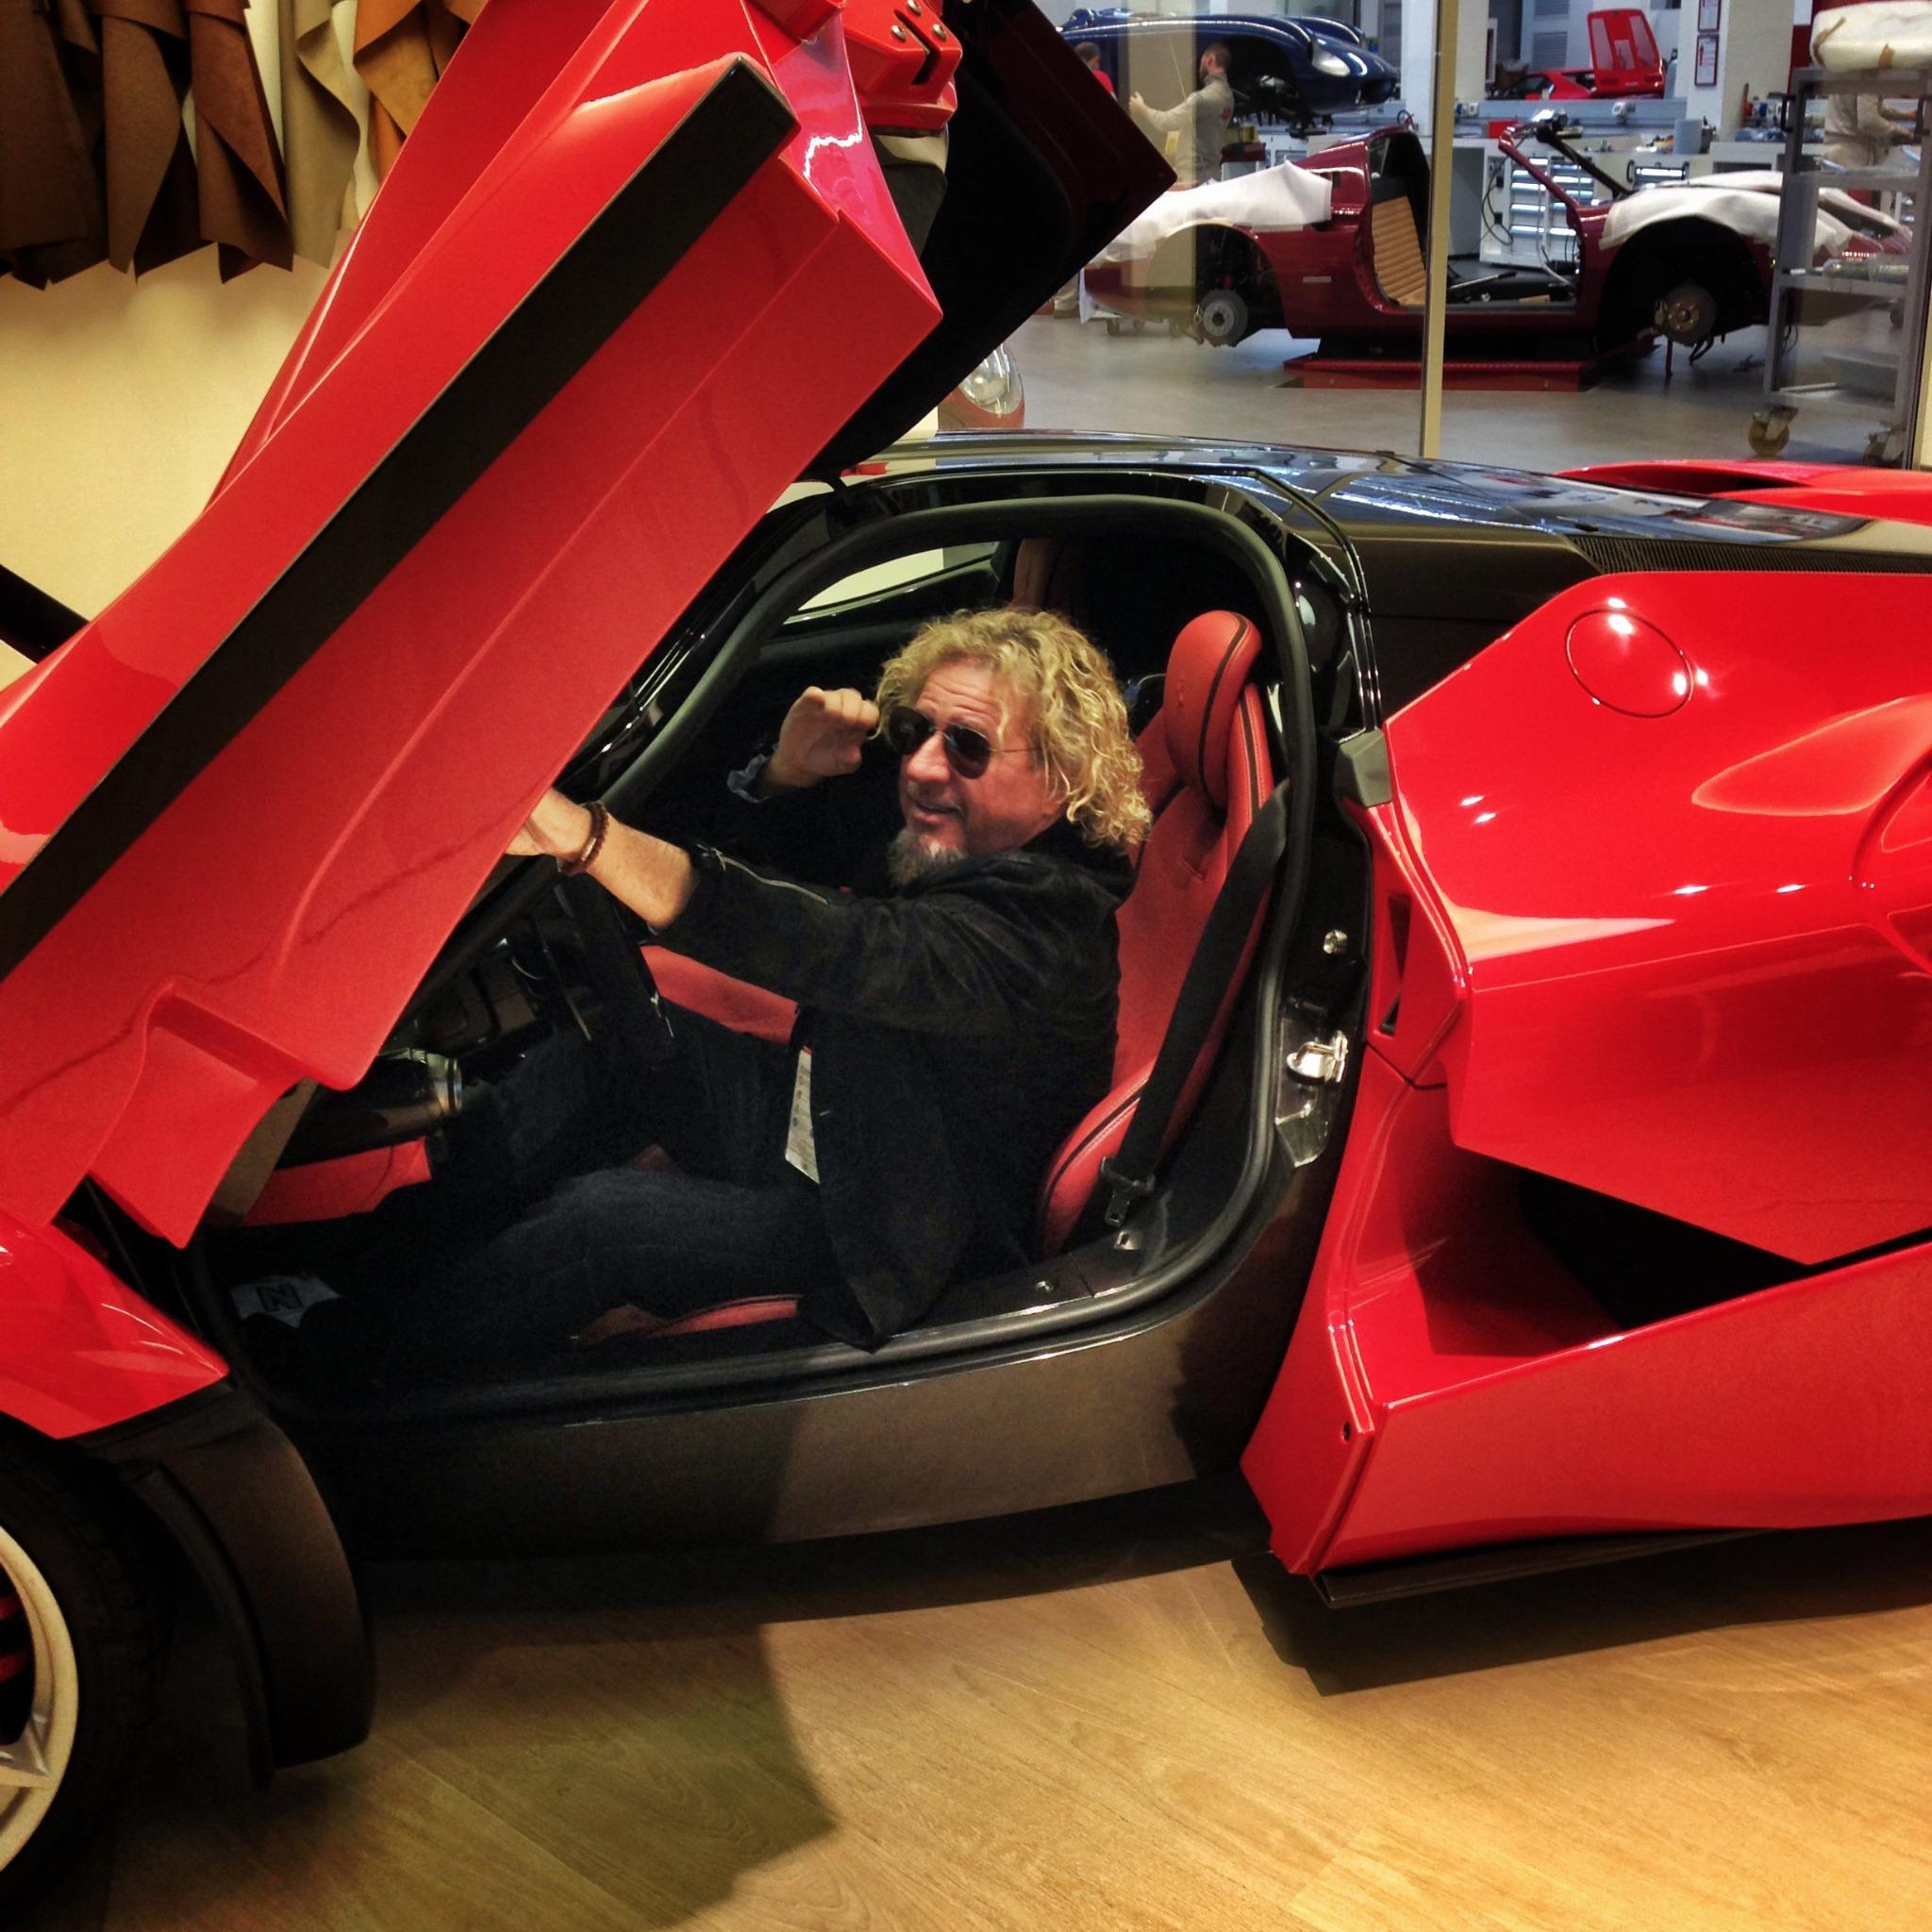 Sammy Hagar On Twitter Quot Visiting The Ferrari Factory To